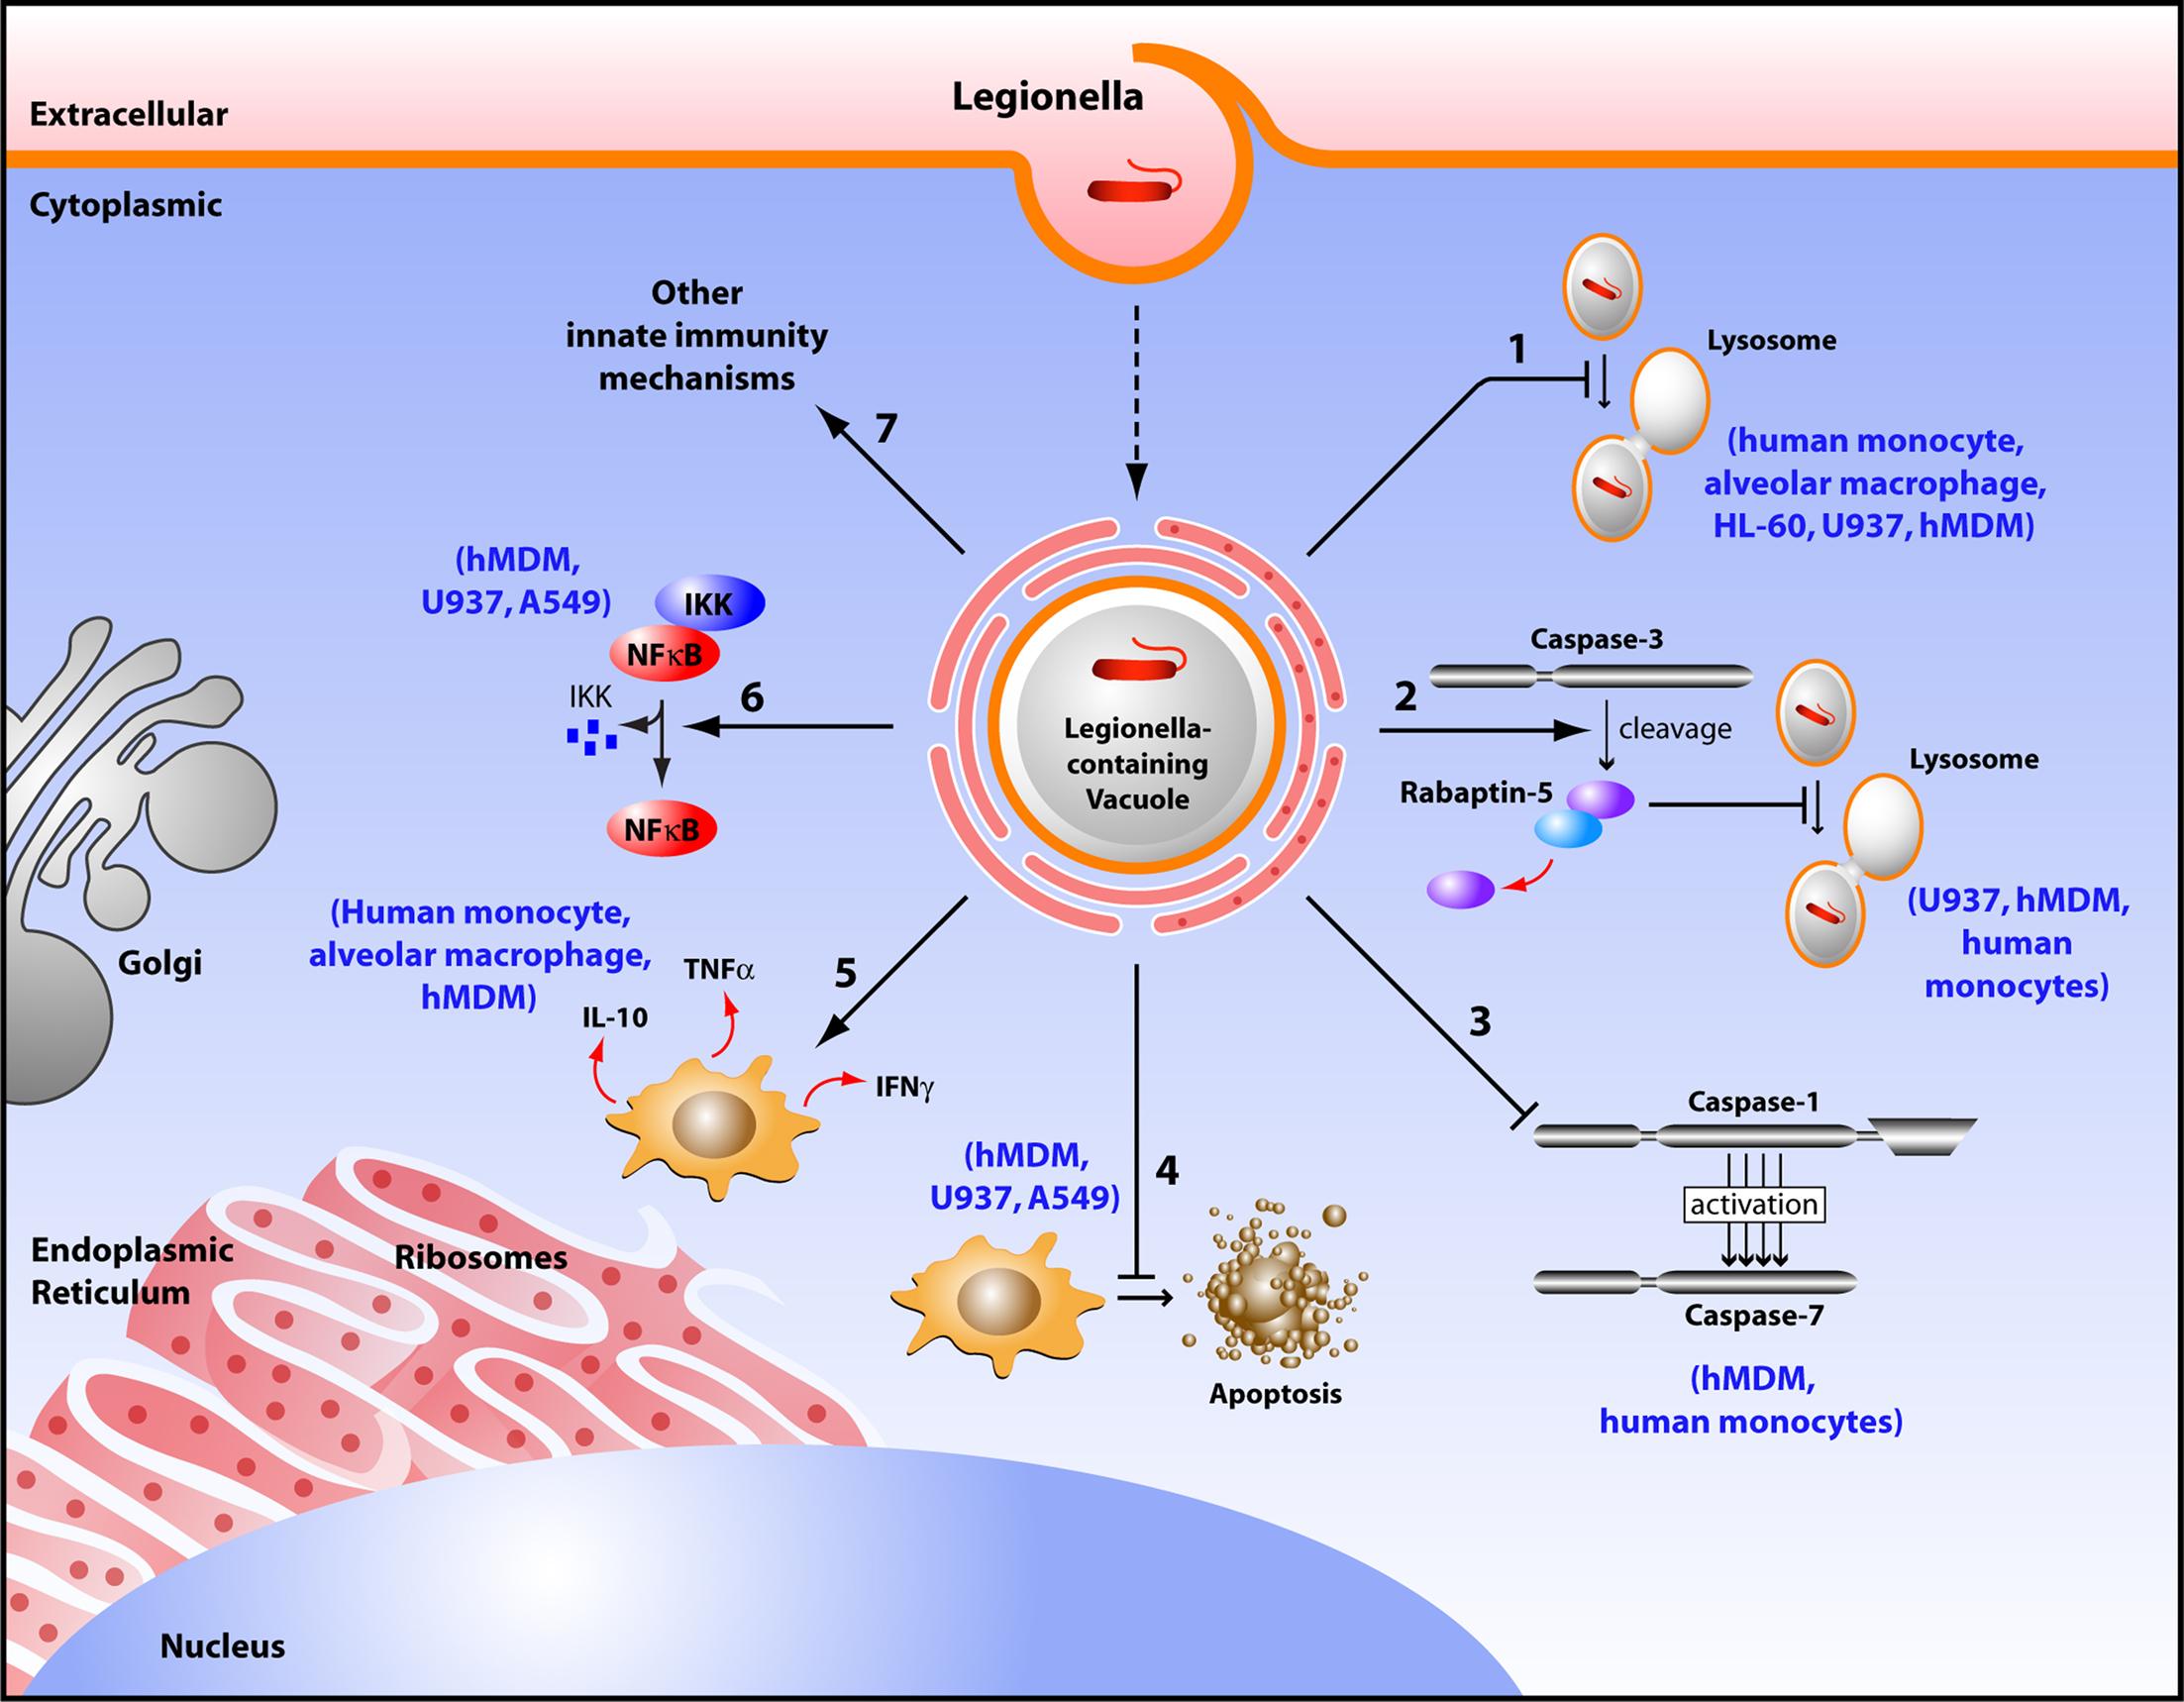 Frontiers | Replication of Legionella Pneumophila in Human Cells ...